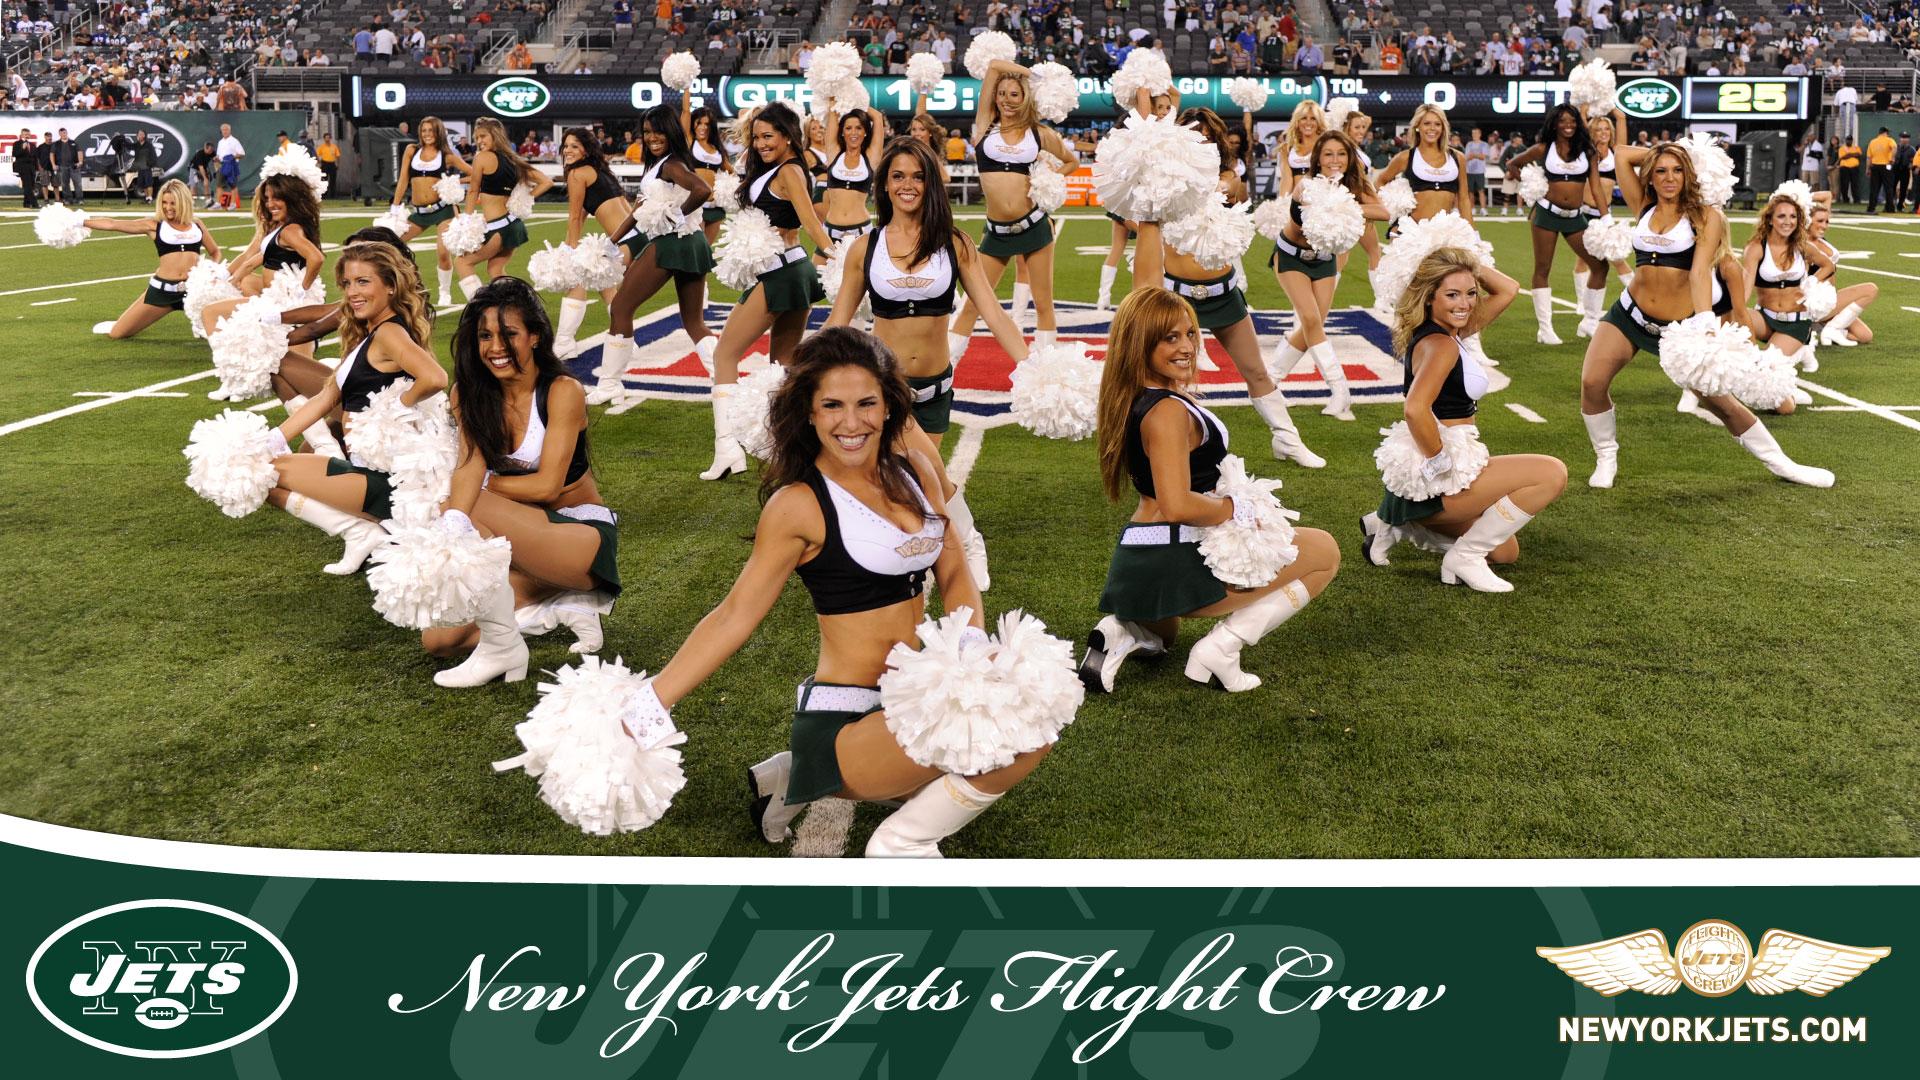 hottest cheerleaders 2013 wallpaper 1920x1080 - photo #2